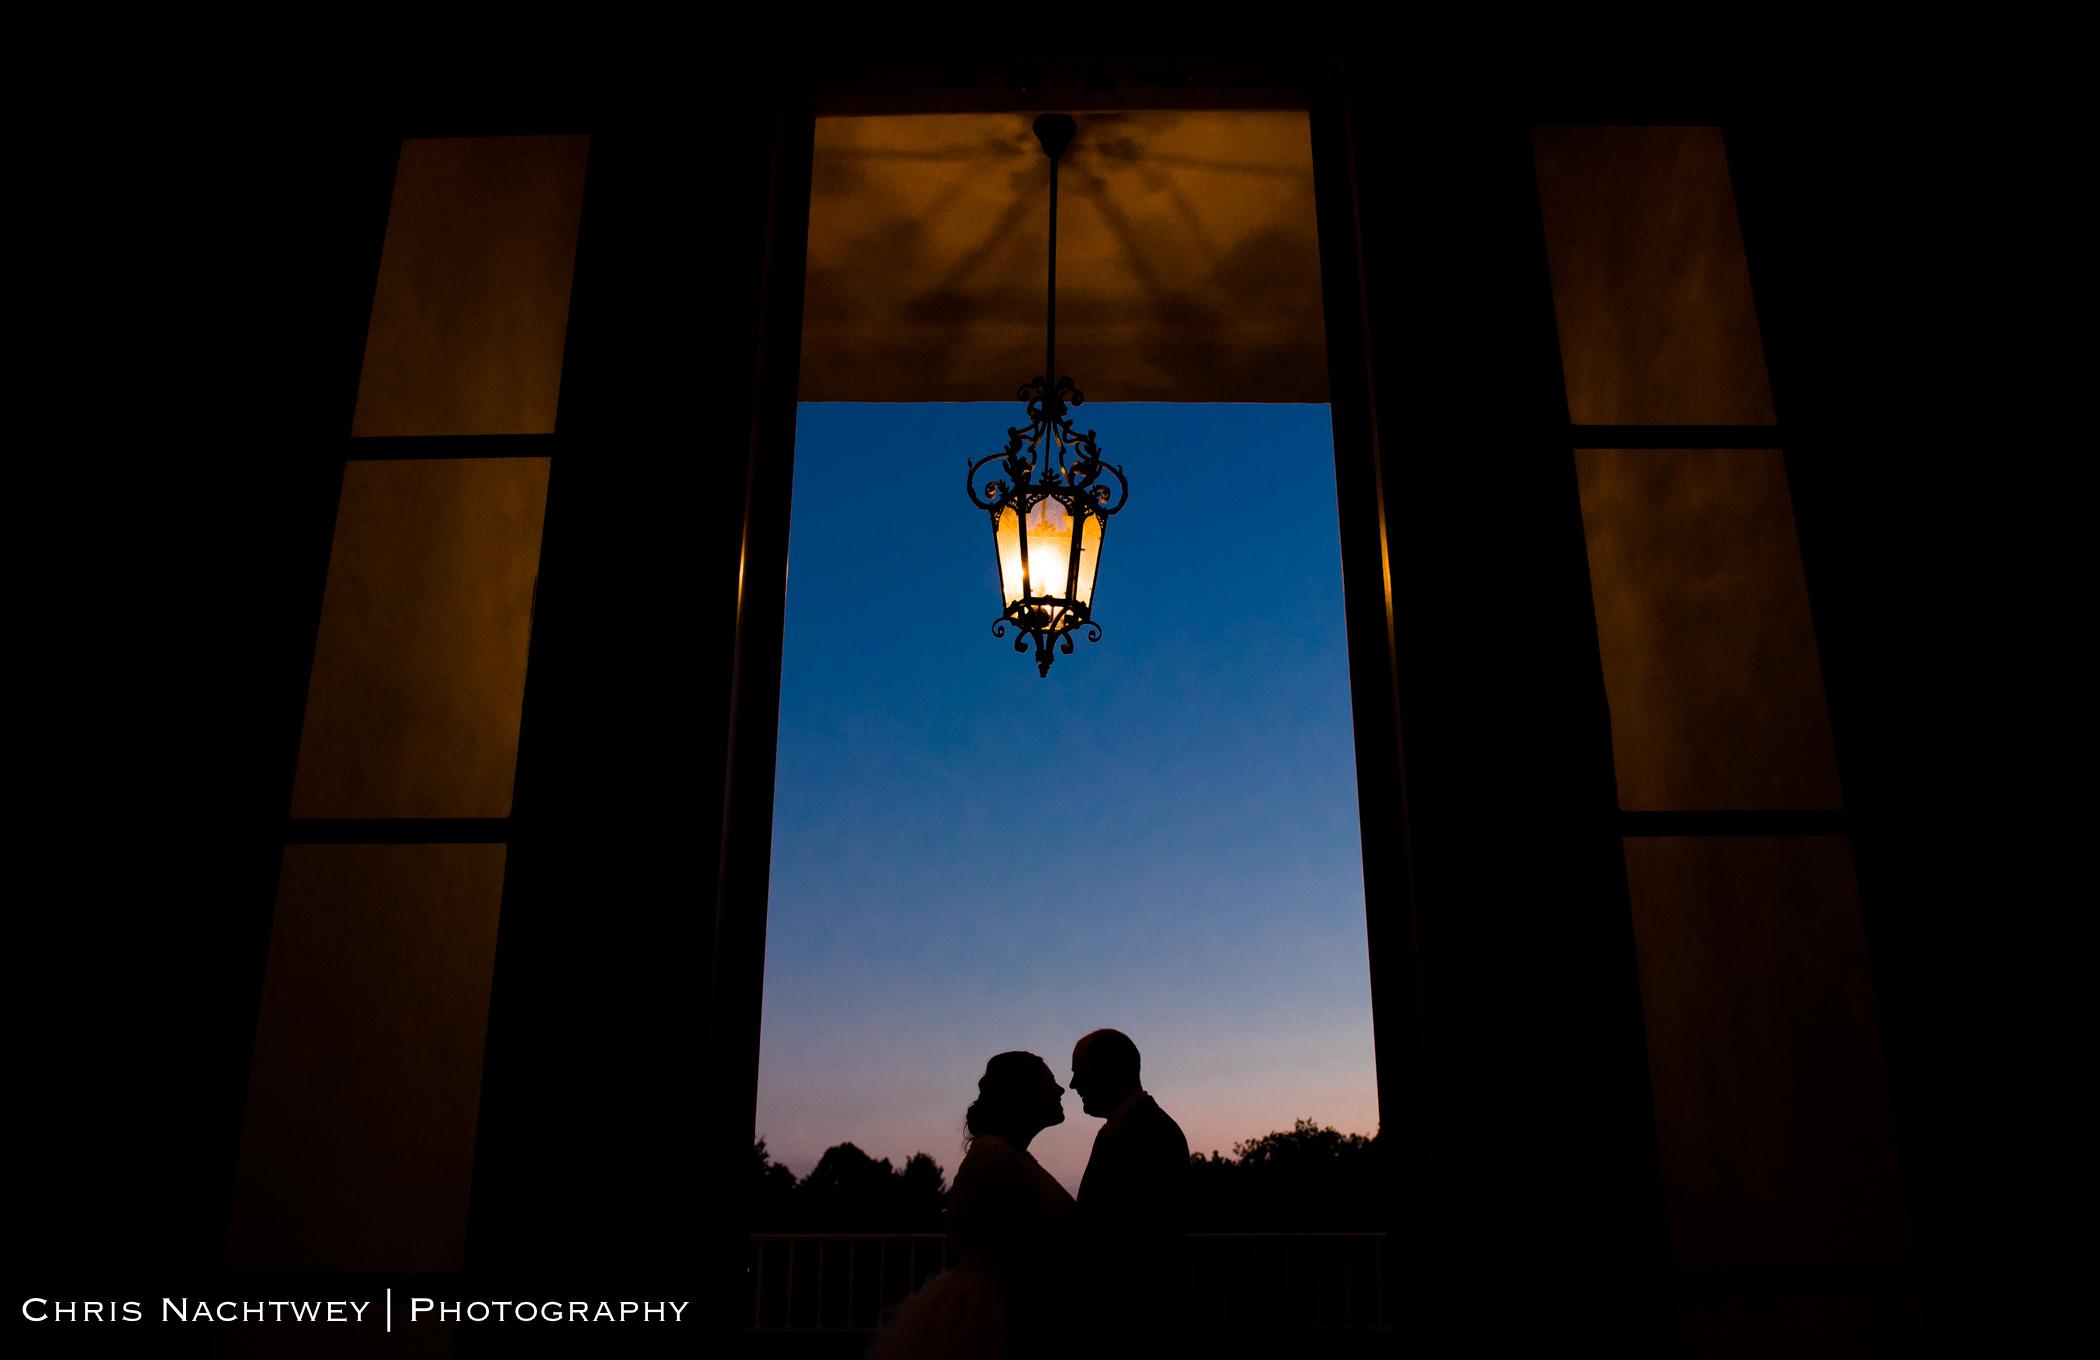 artistic-ct-wedding-photographers-chris-nachtwey-2017-43.jpg